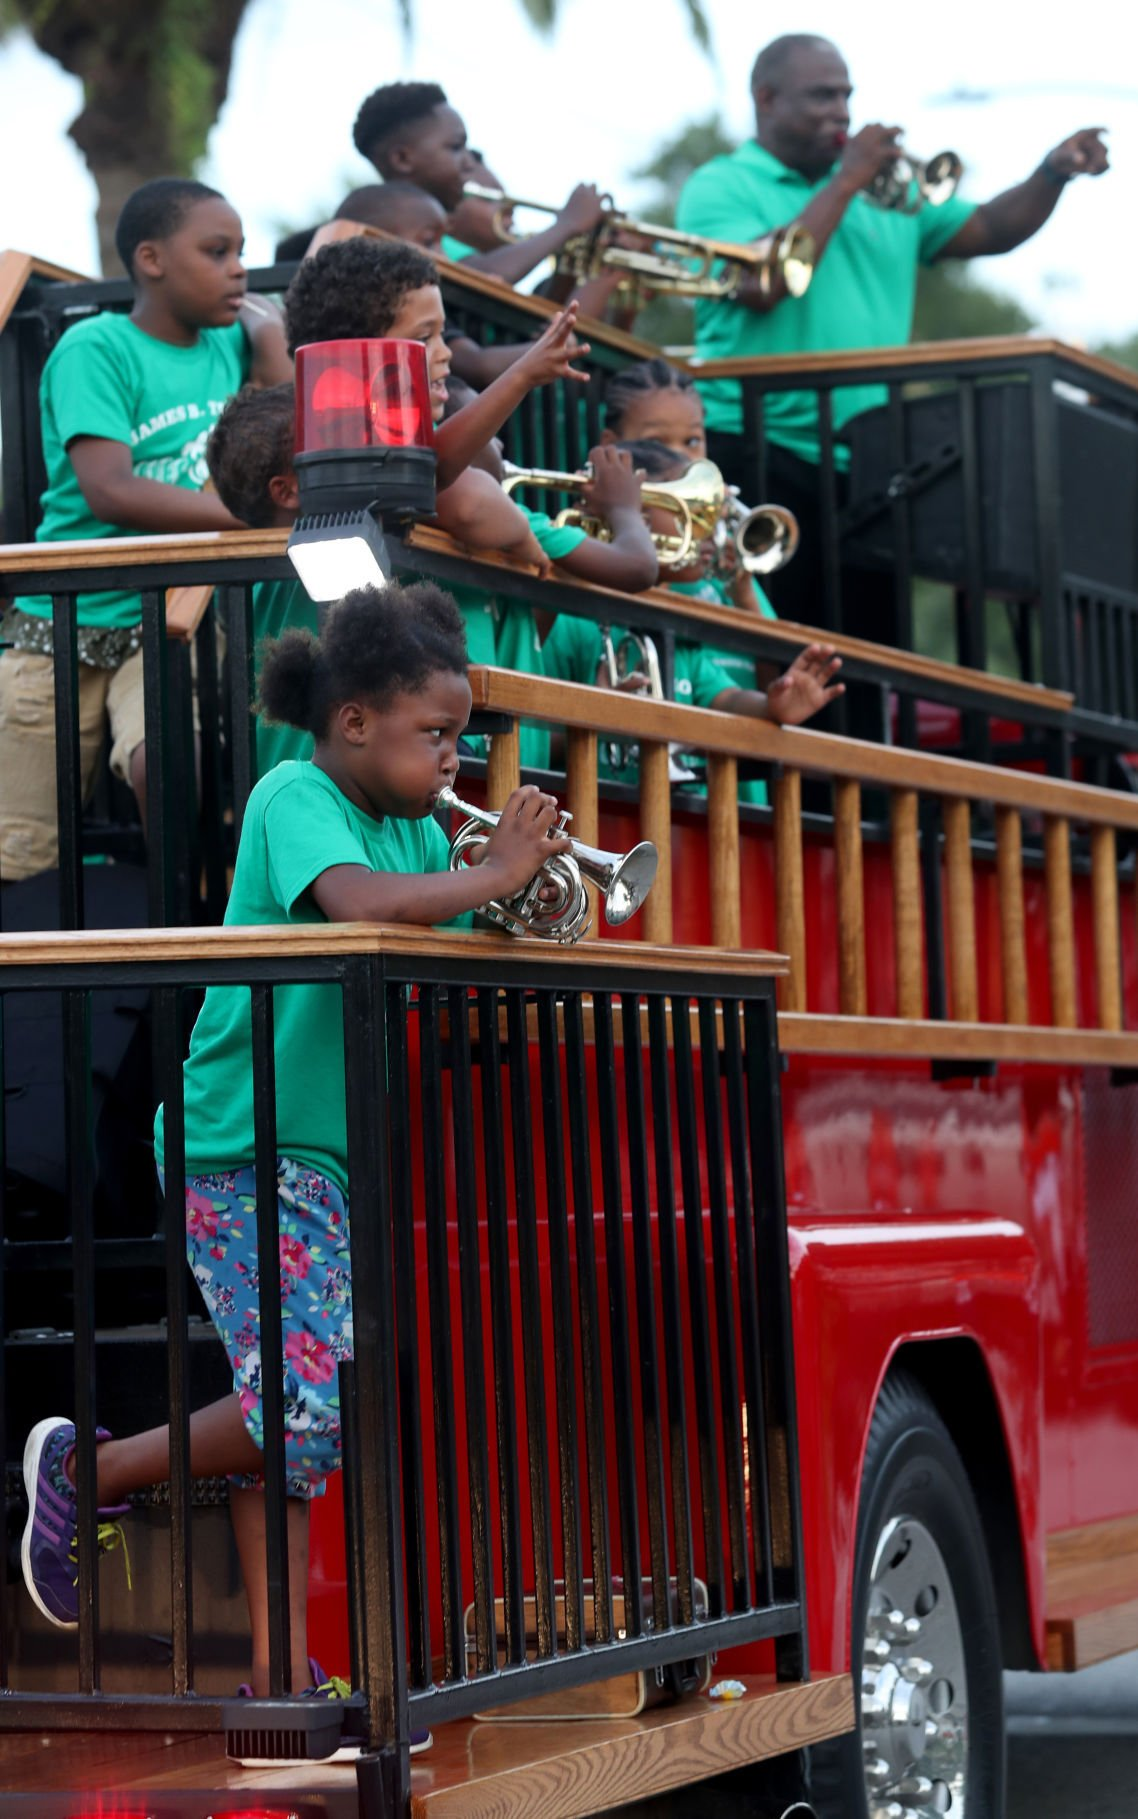 Galveston celebrates Juneteenth with annual parade